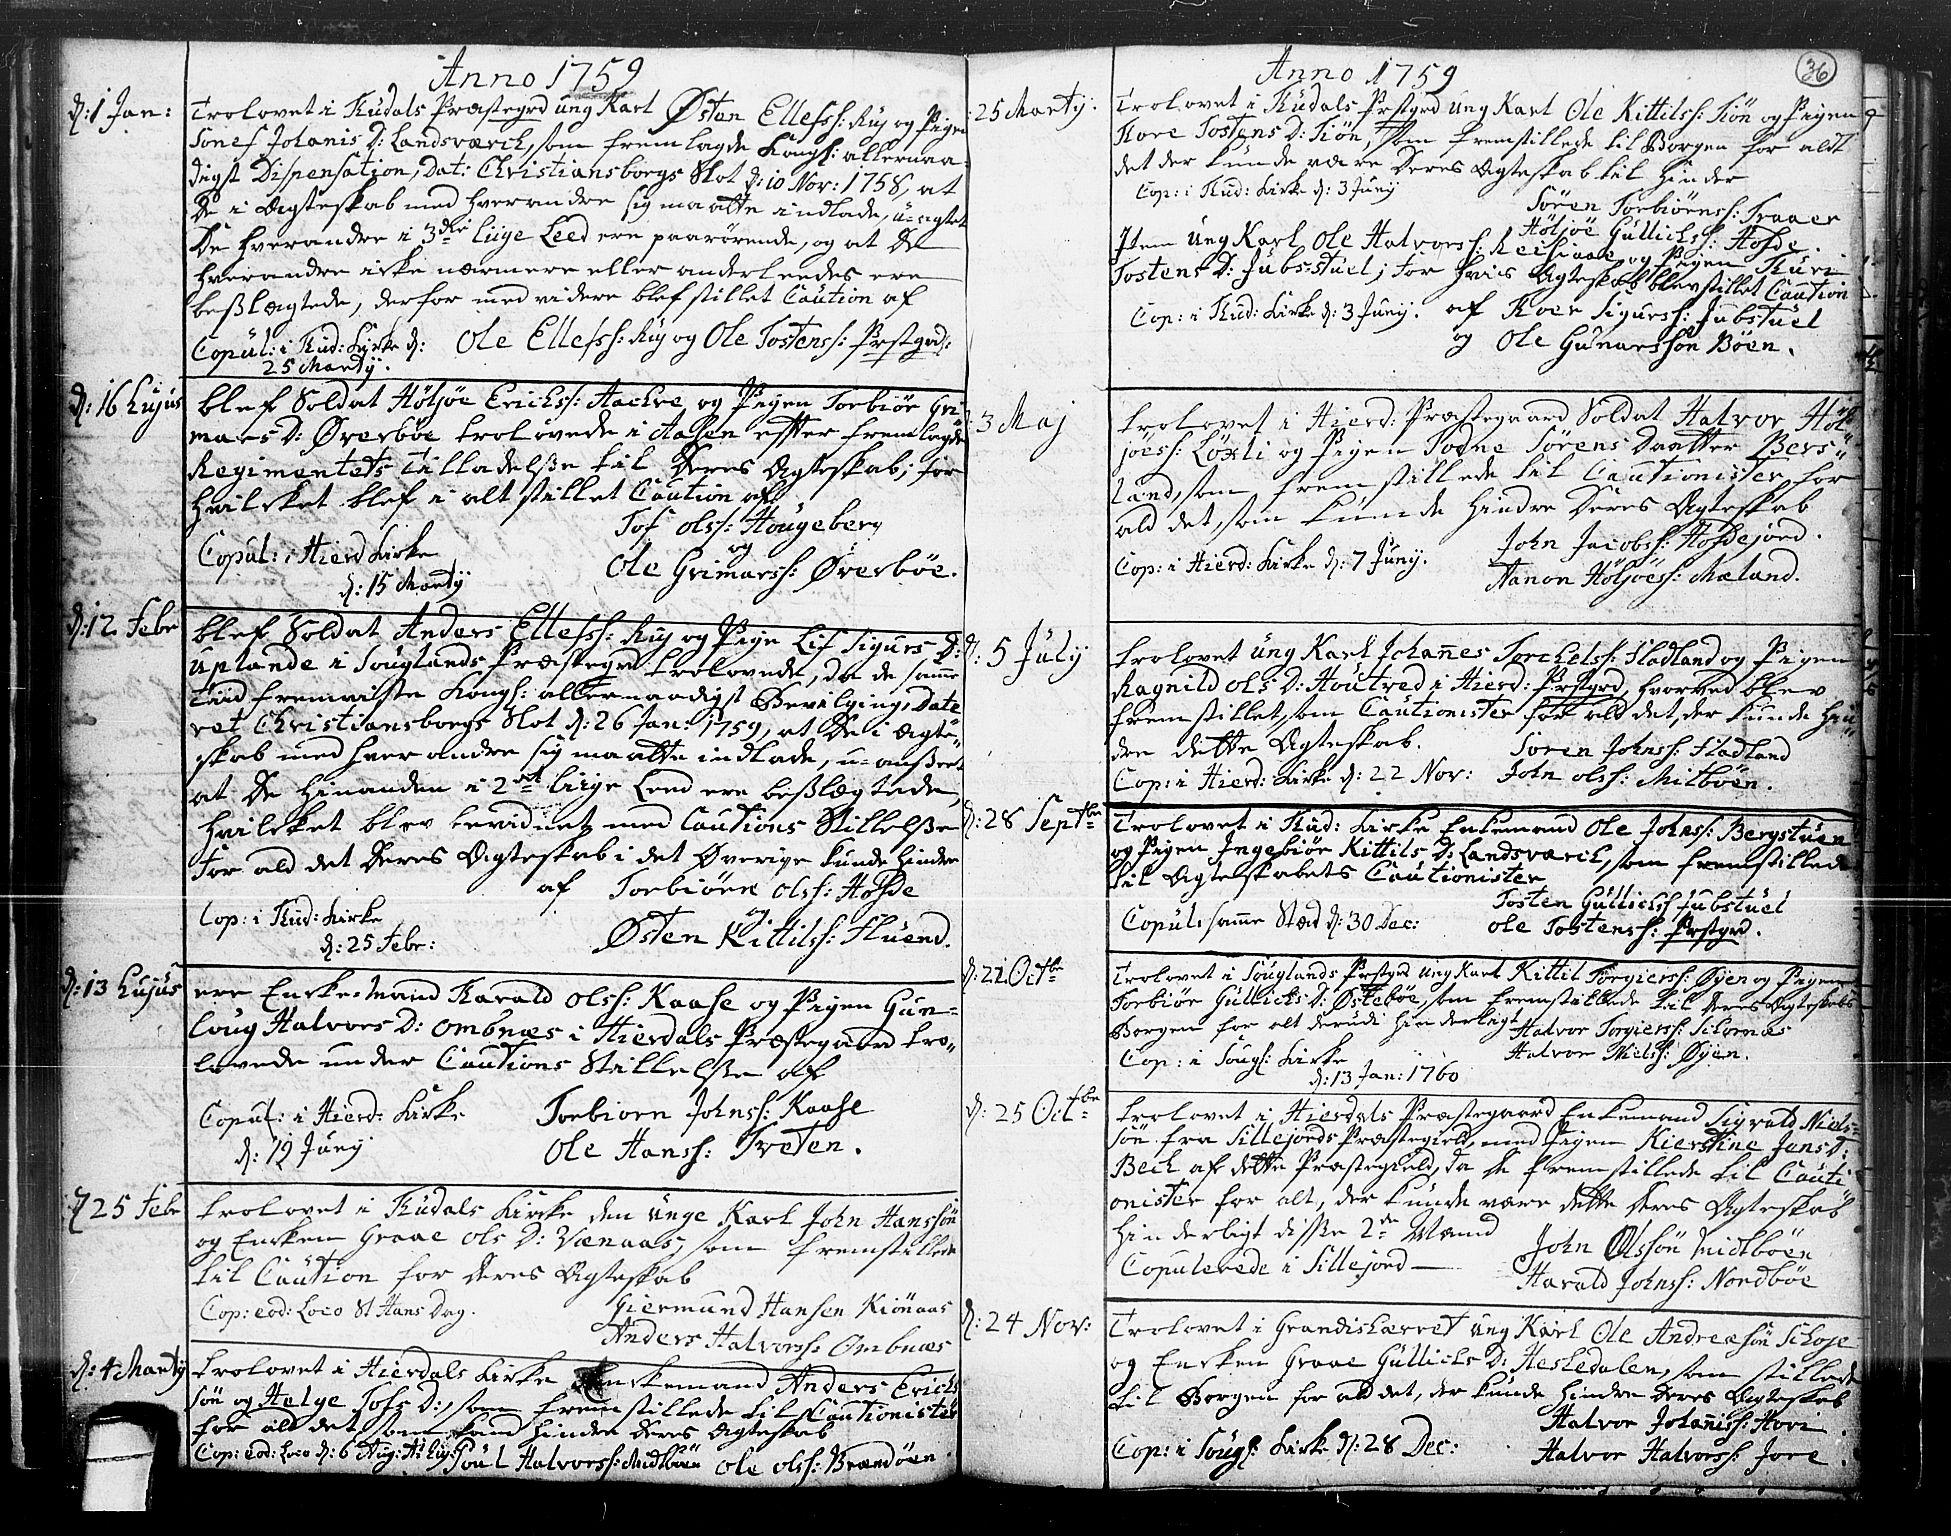 SAKO, Hjartdal kirkebøker, F/Fa/L0004: Ministerialbok nr. I 4, 1727-1795, s. 36